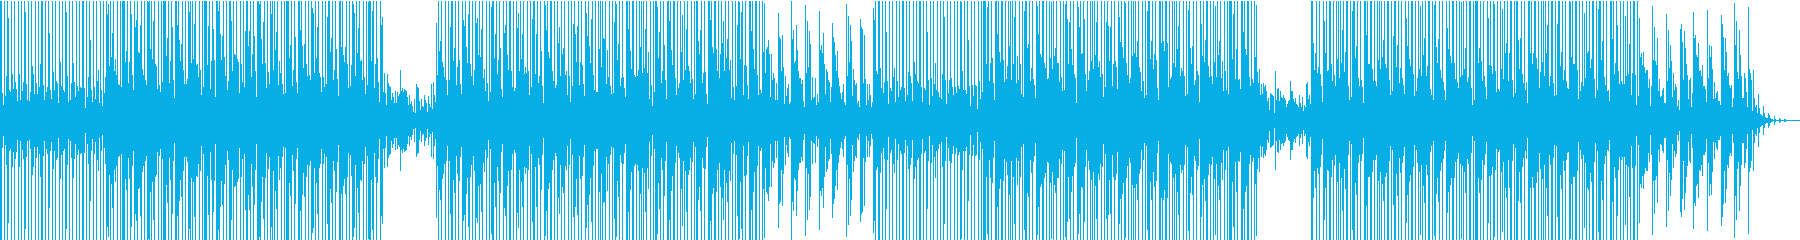 Vlog、実況、説明、商品紹介系BGM3の再生済みの波形